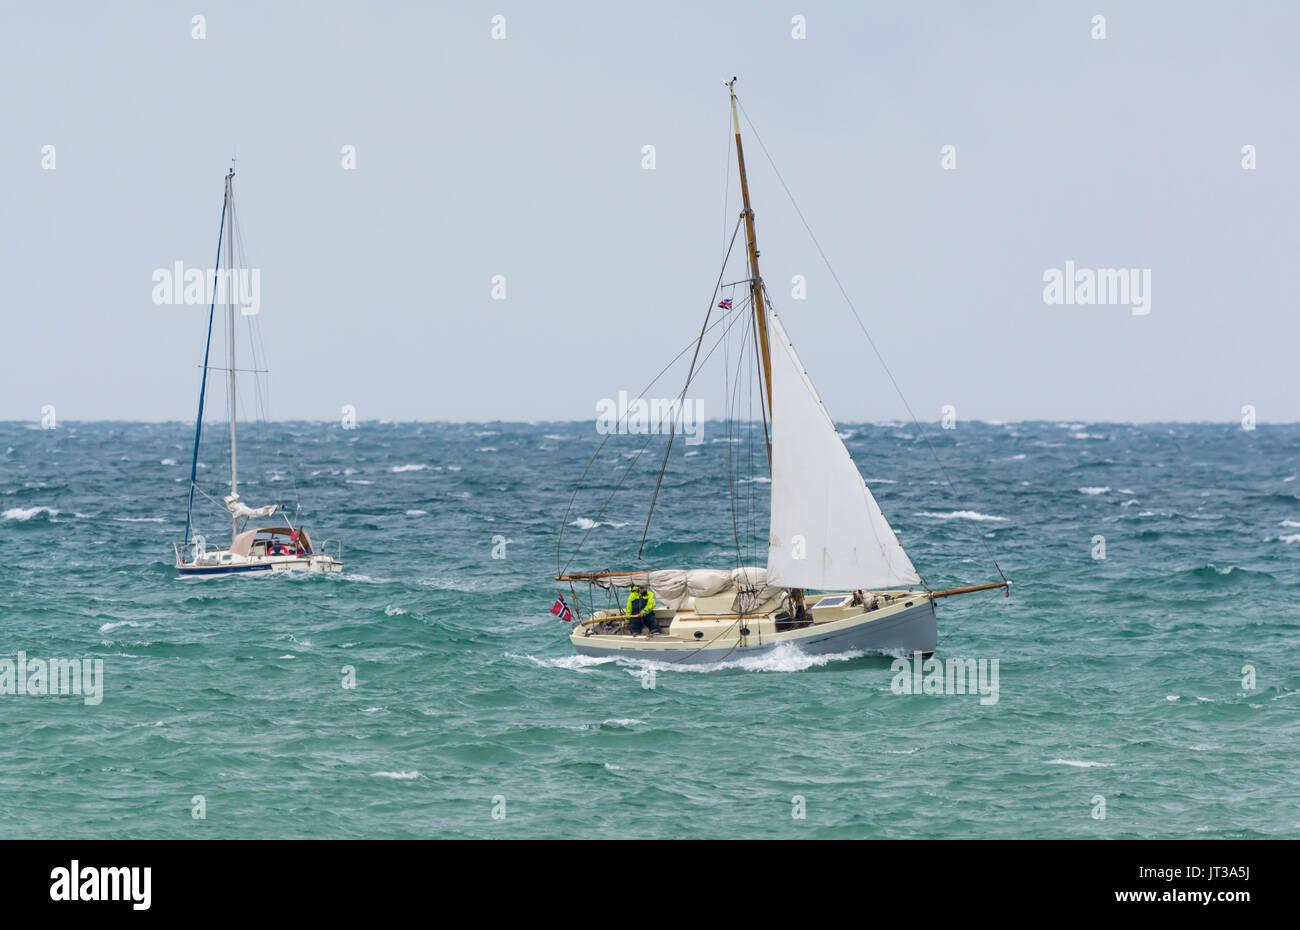 Yachts At Sea On A Windy Day Small Sailing Boats Rough Seas